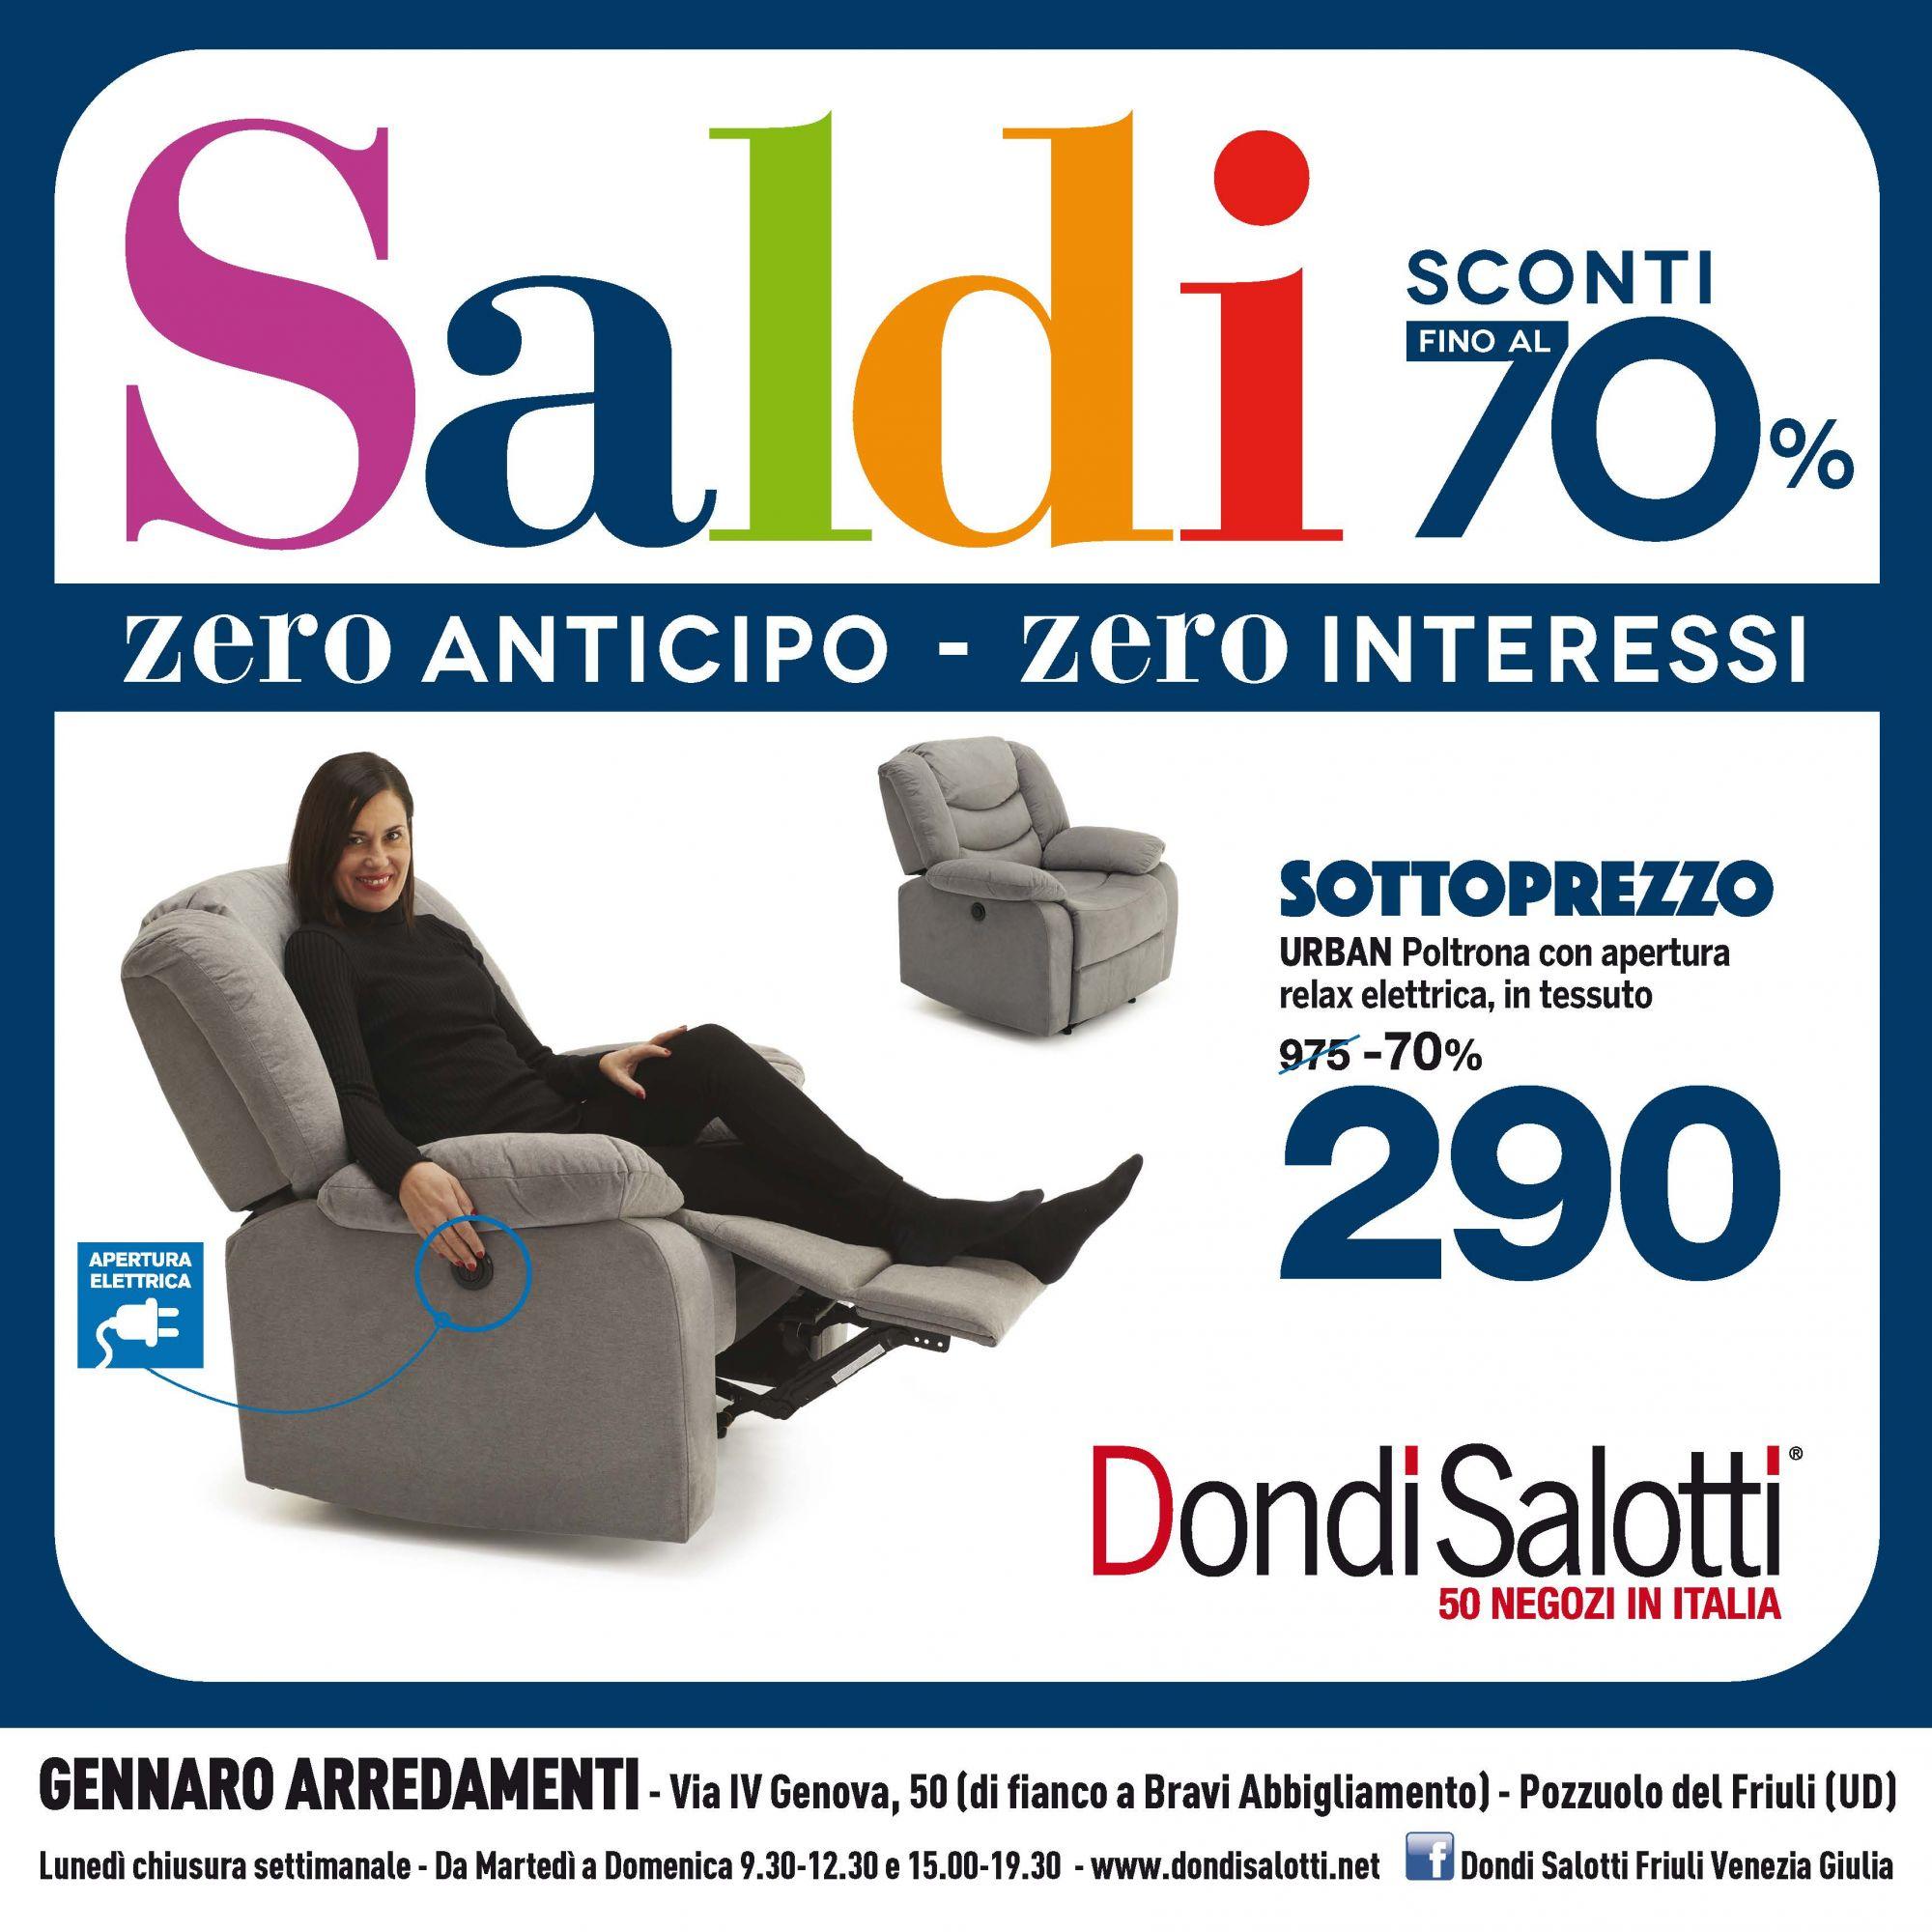 Best Dondi Salotti Opinioni Contemporary - acrylicgiftware.us ...